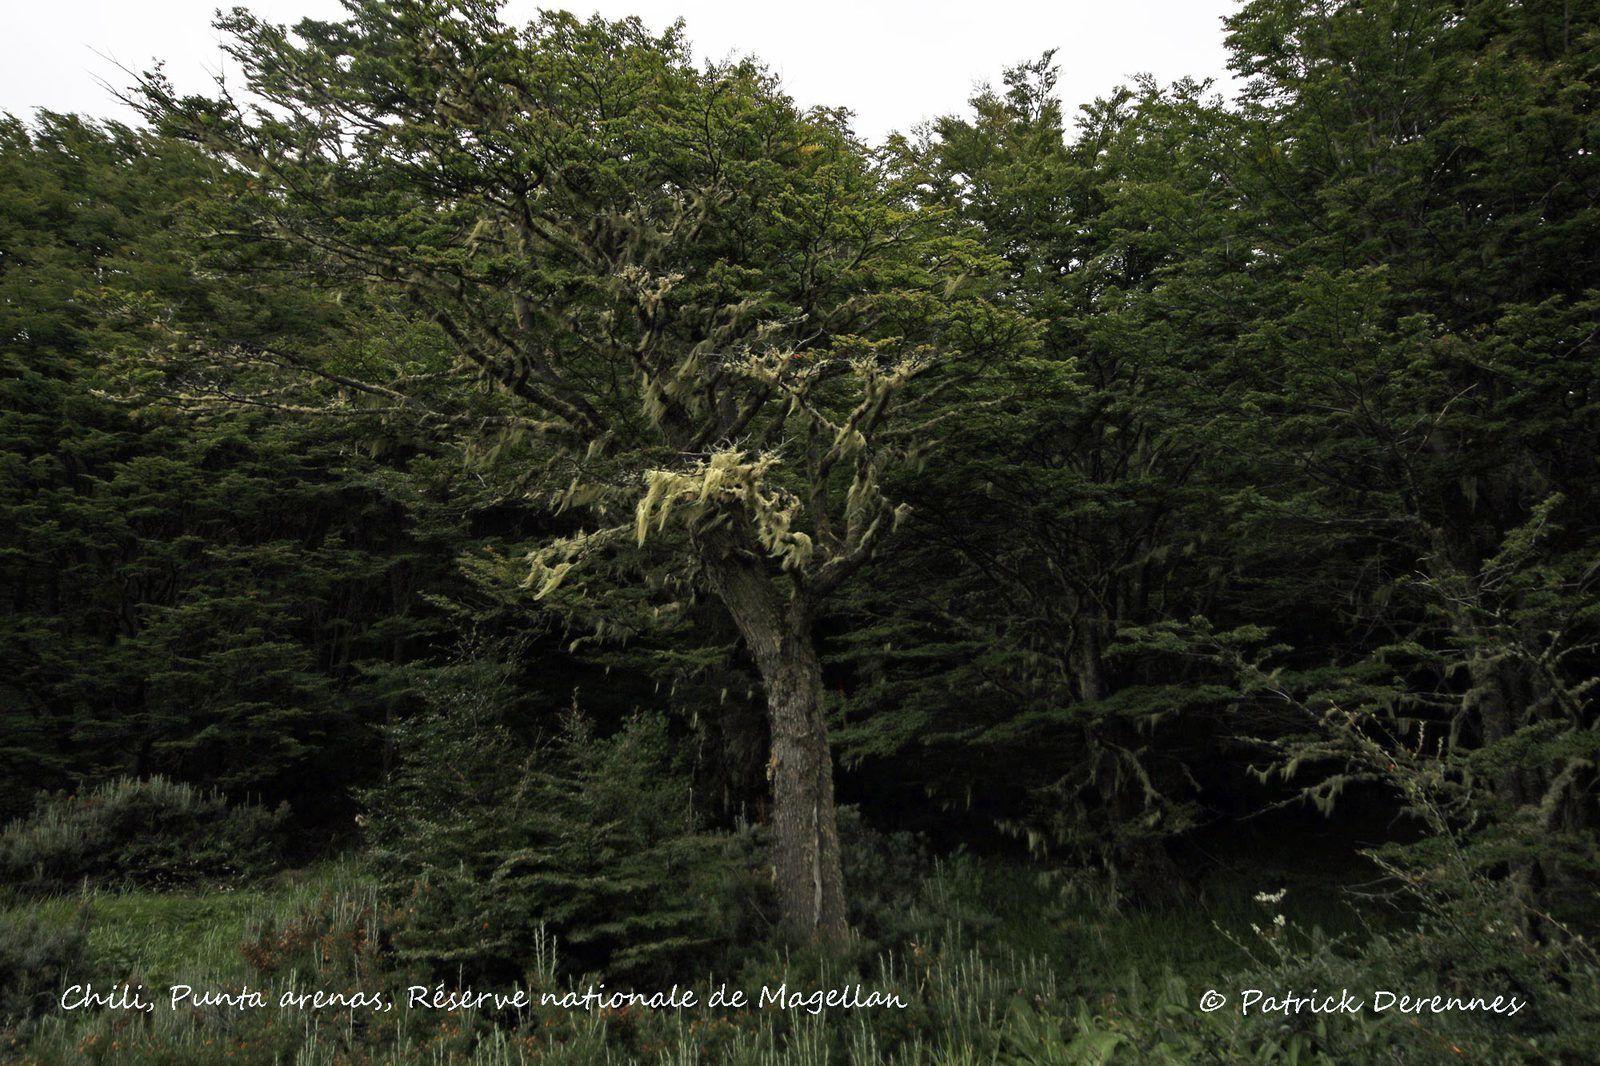 Punta arenas - Nothofagus cf. betuloides et parasites